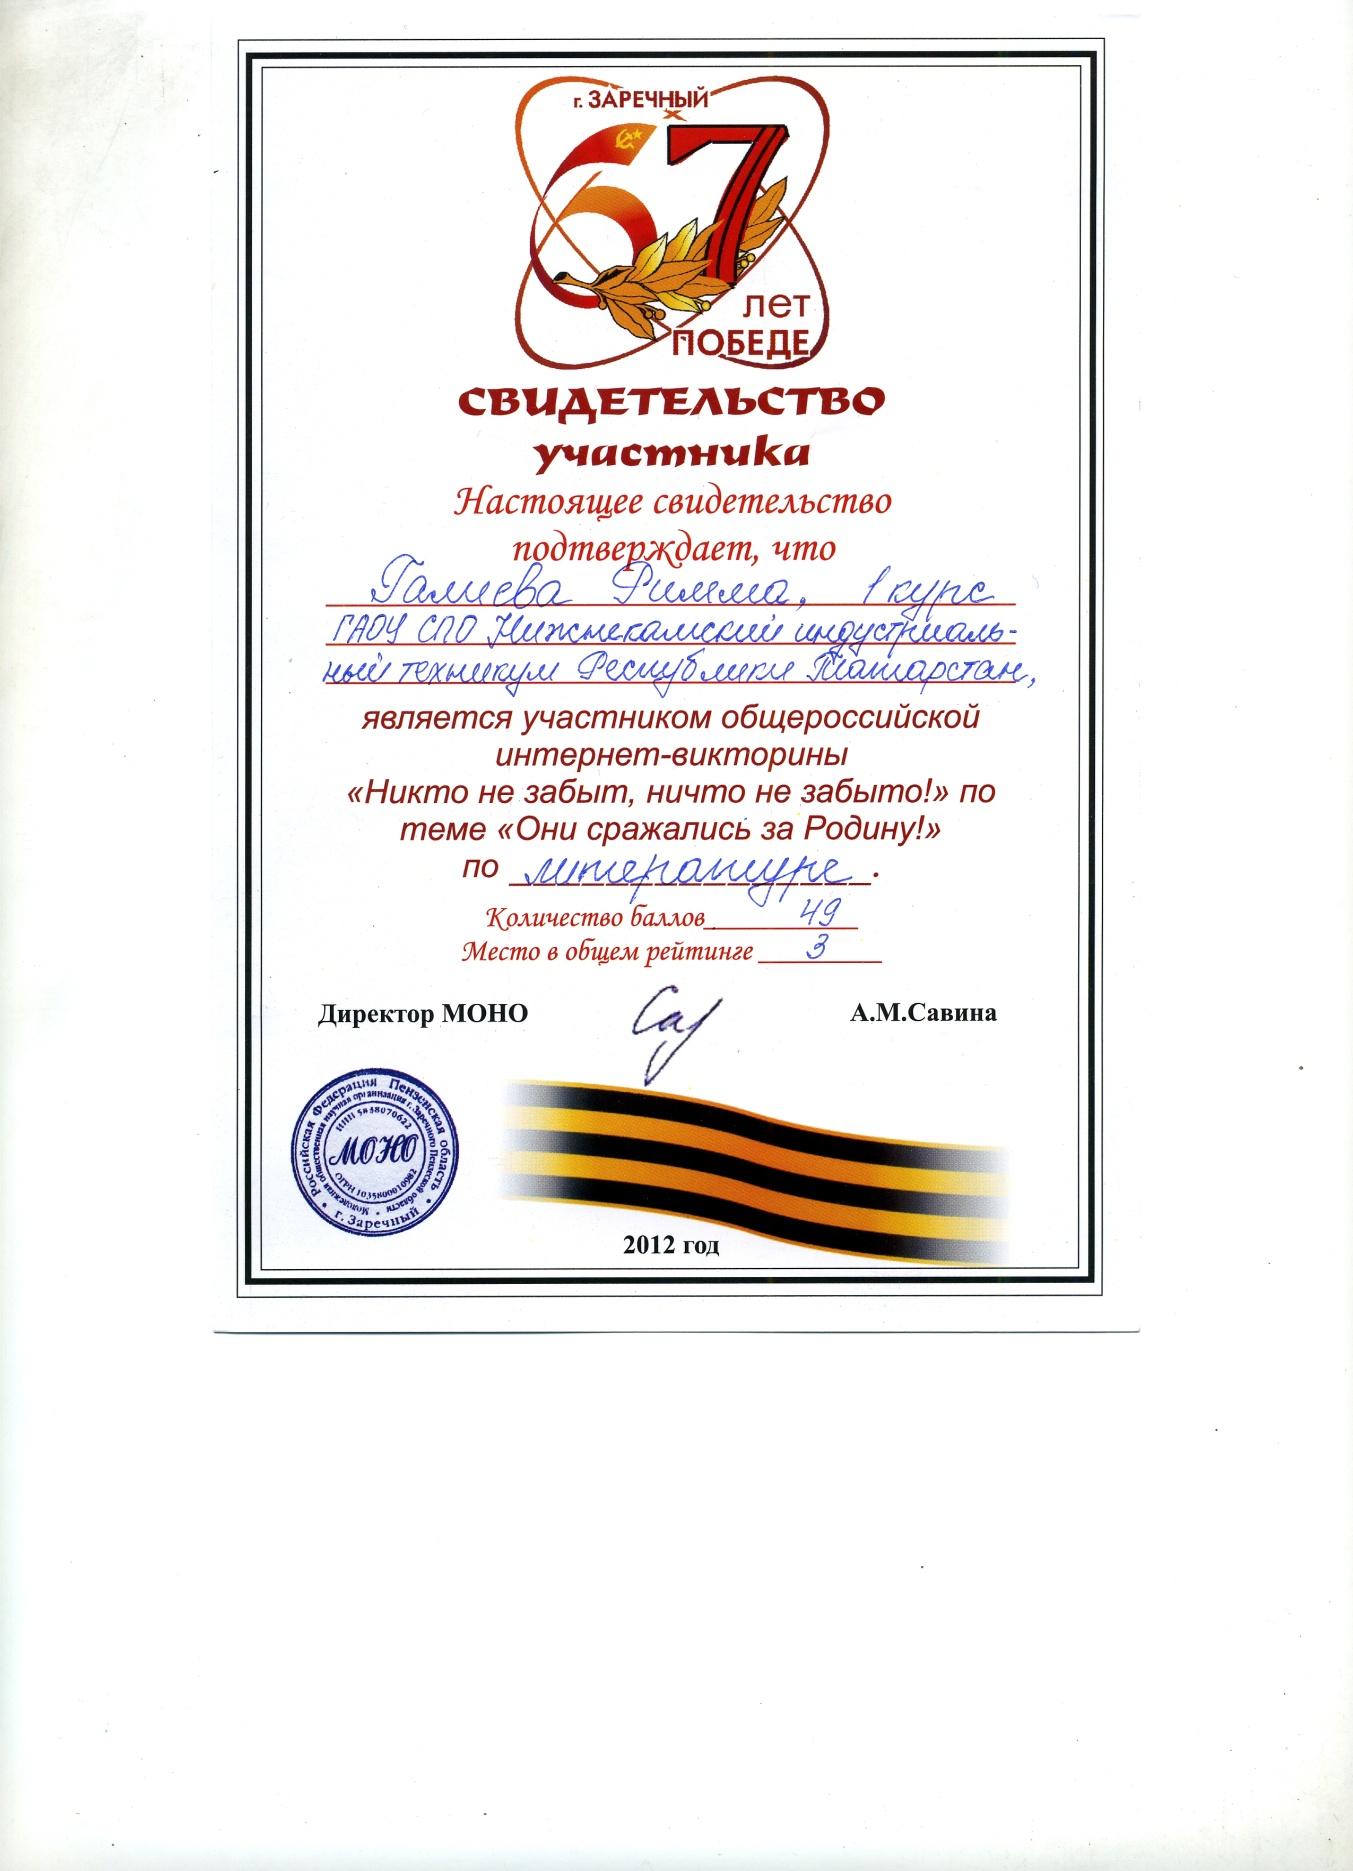 F:\Всероссйский конкурс Портфолио выпускника\РИММА\img764.jpg